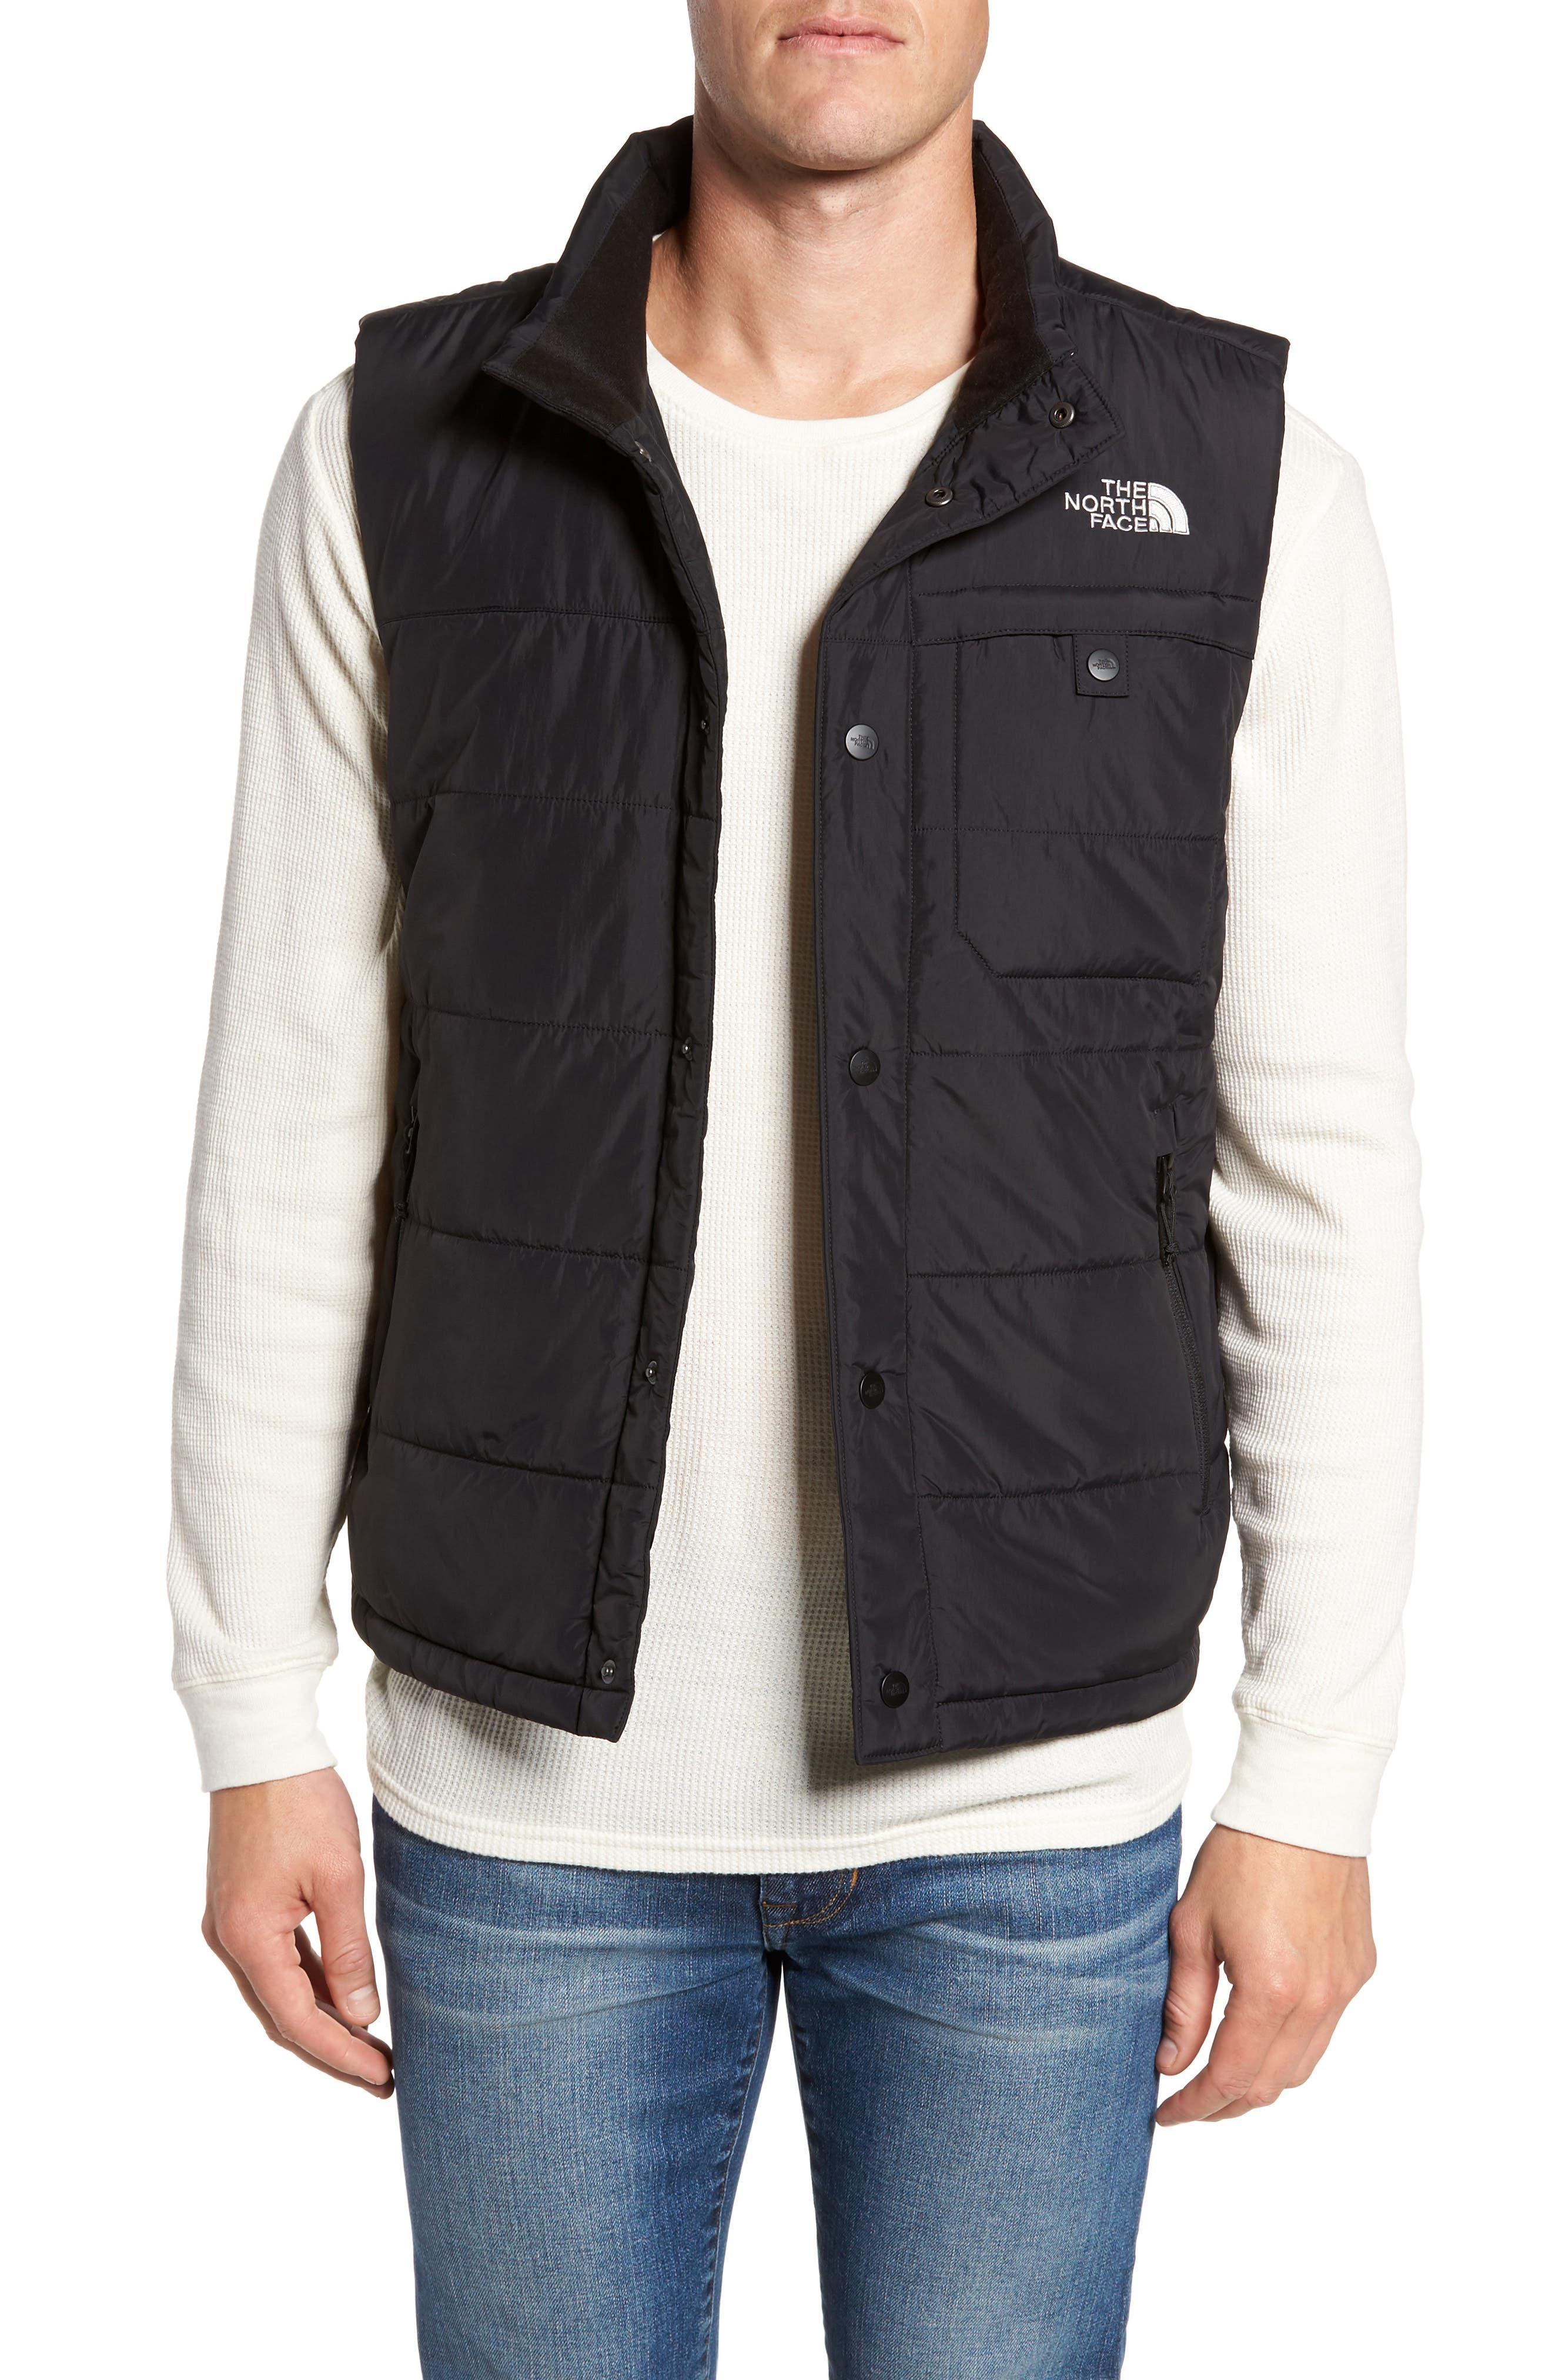 Harway Heatseeker Insulated Vest,                         Main,                         color, Black/ Black